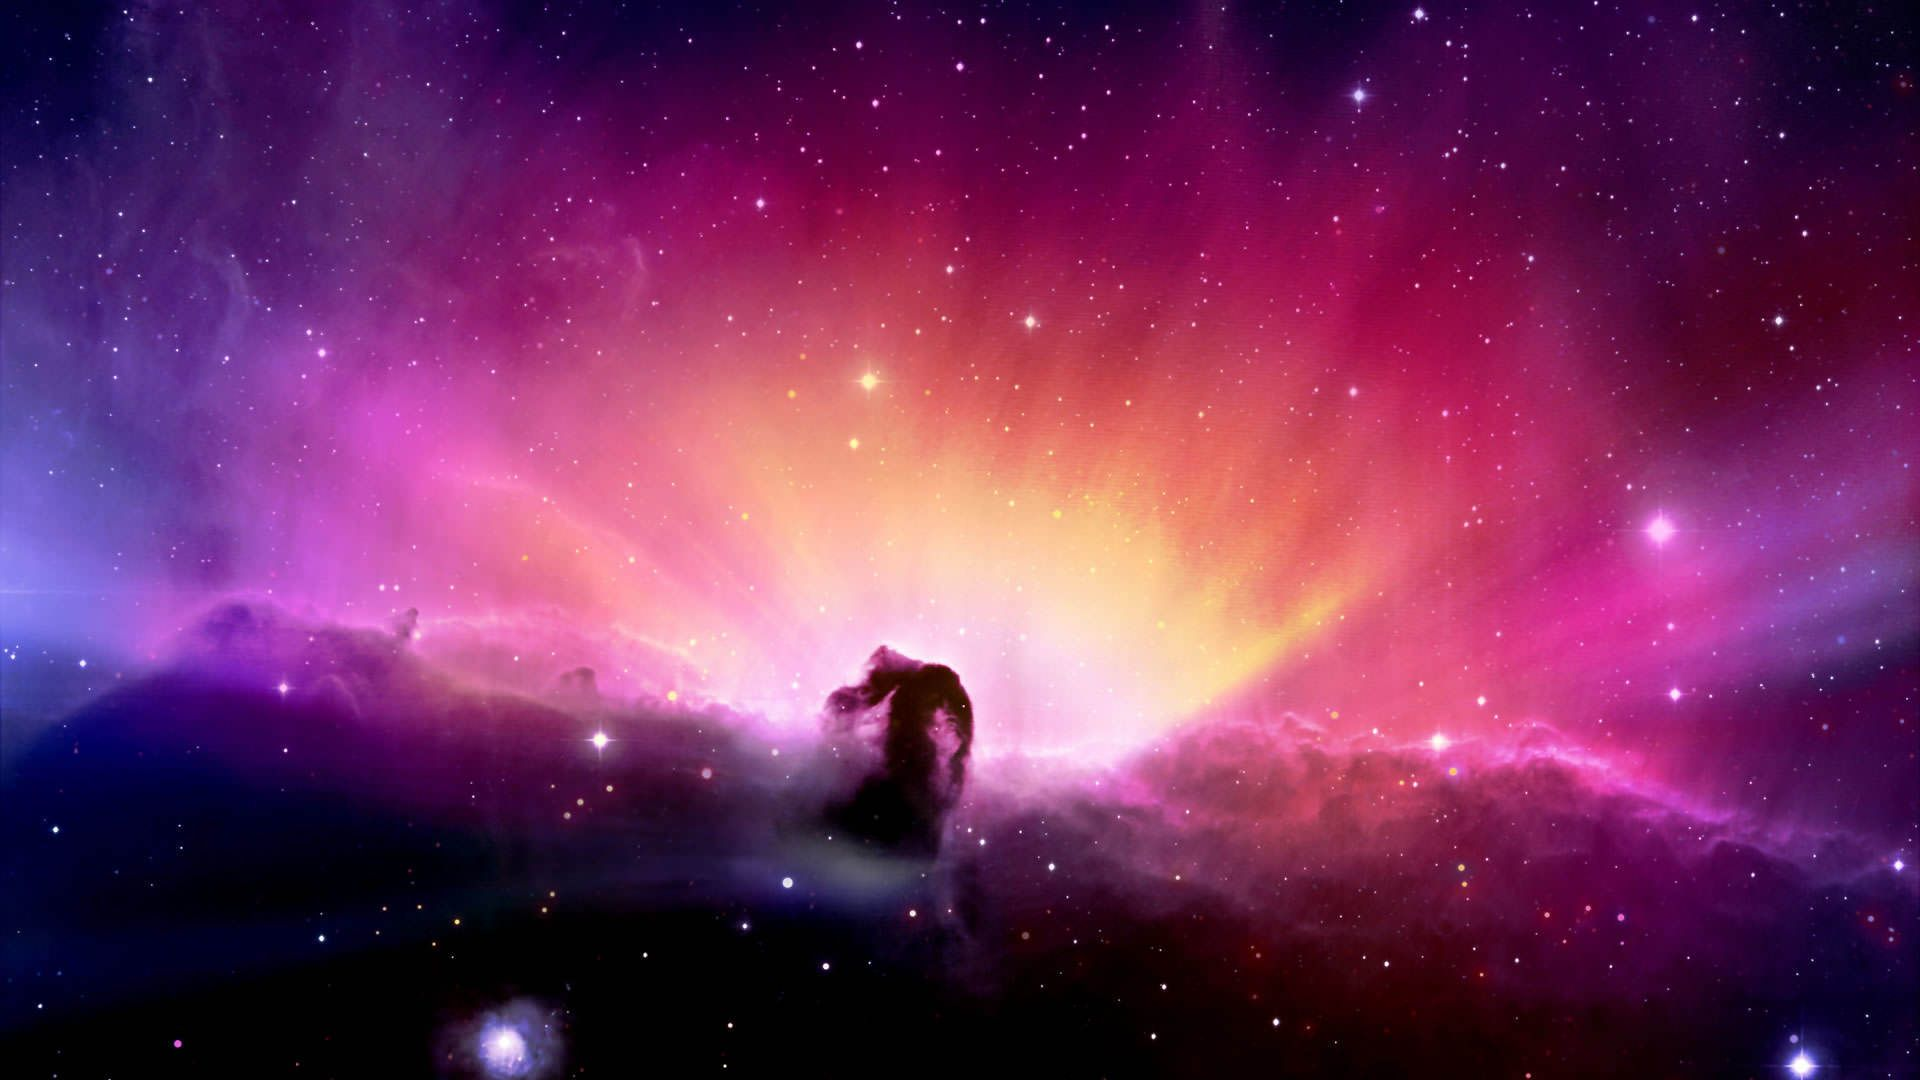 Hubble 4K Wallpapers - Top Free Hubble 4K Backgrounds ...